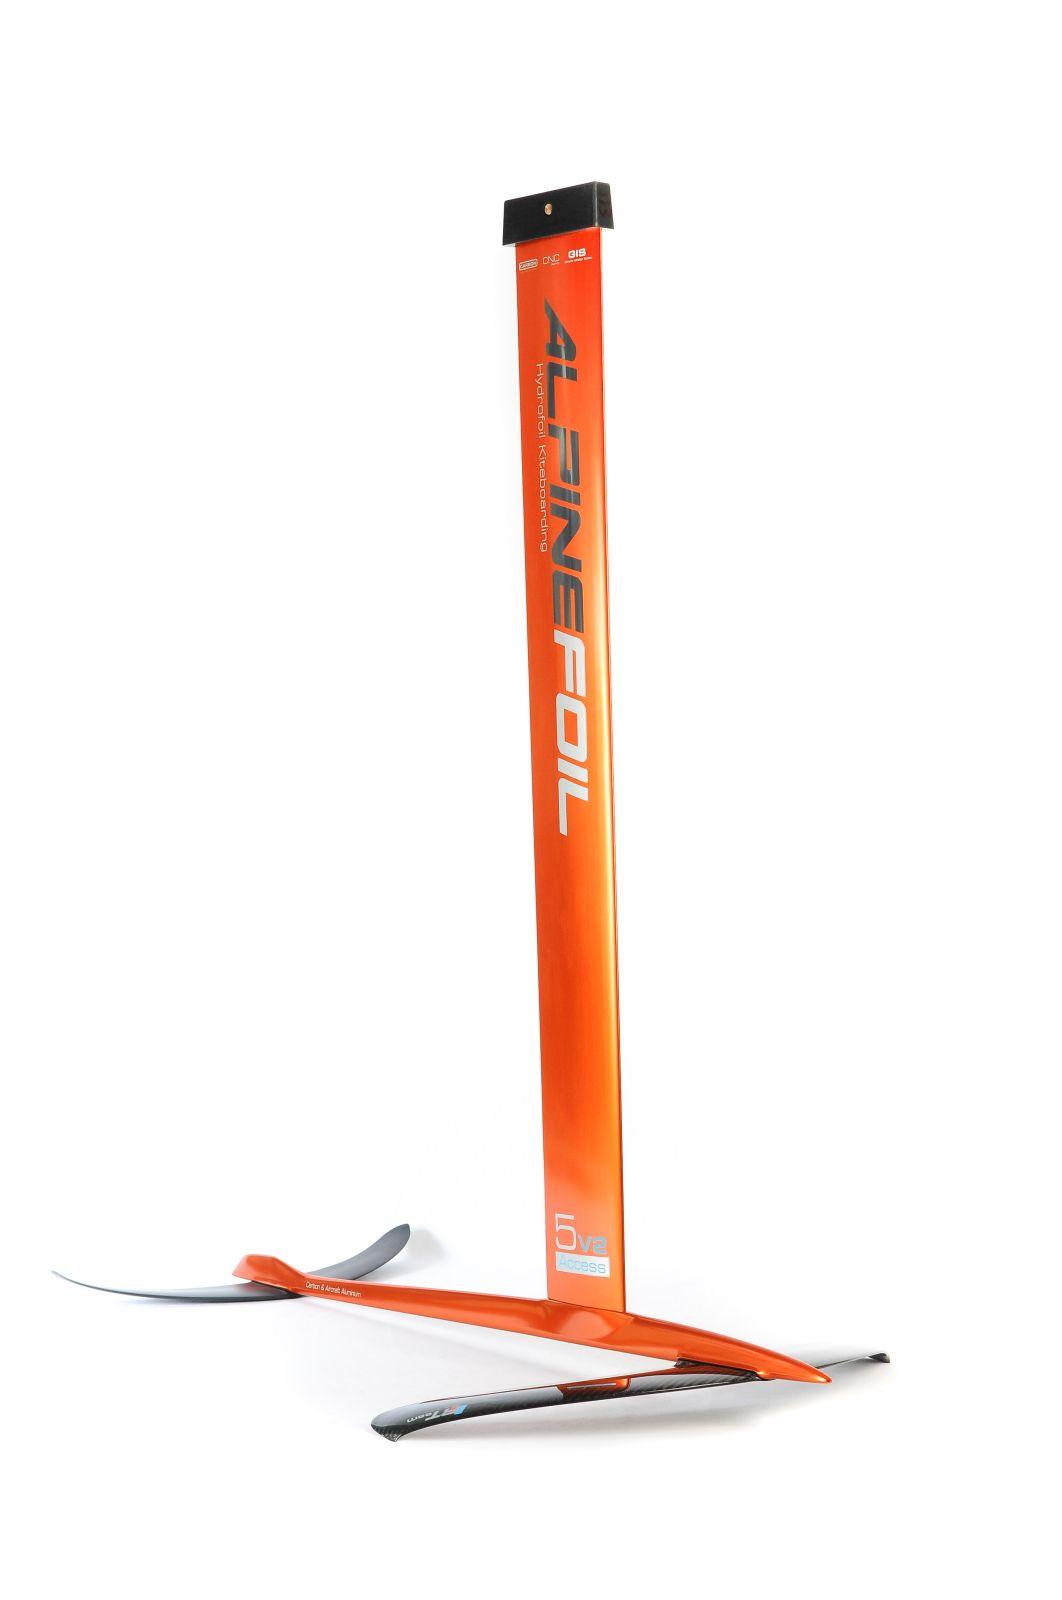 Kitefoil carbon aluminium alpinefoil 5 0 access v2 2525 1